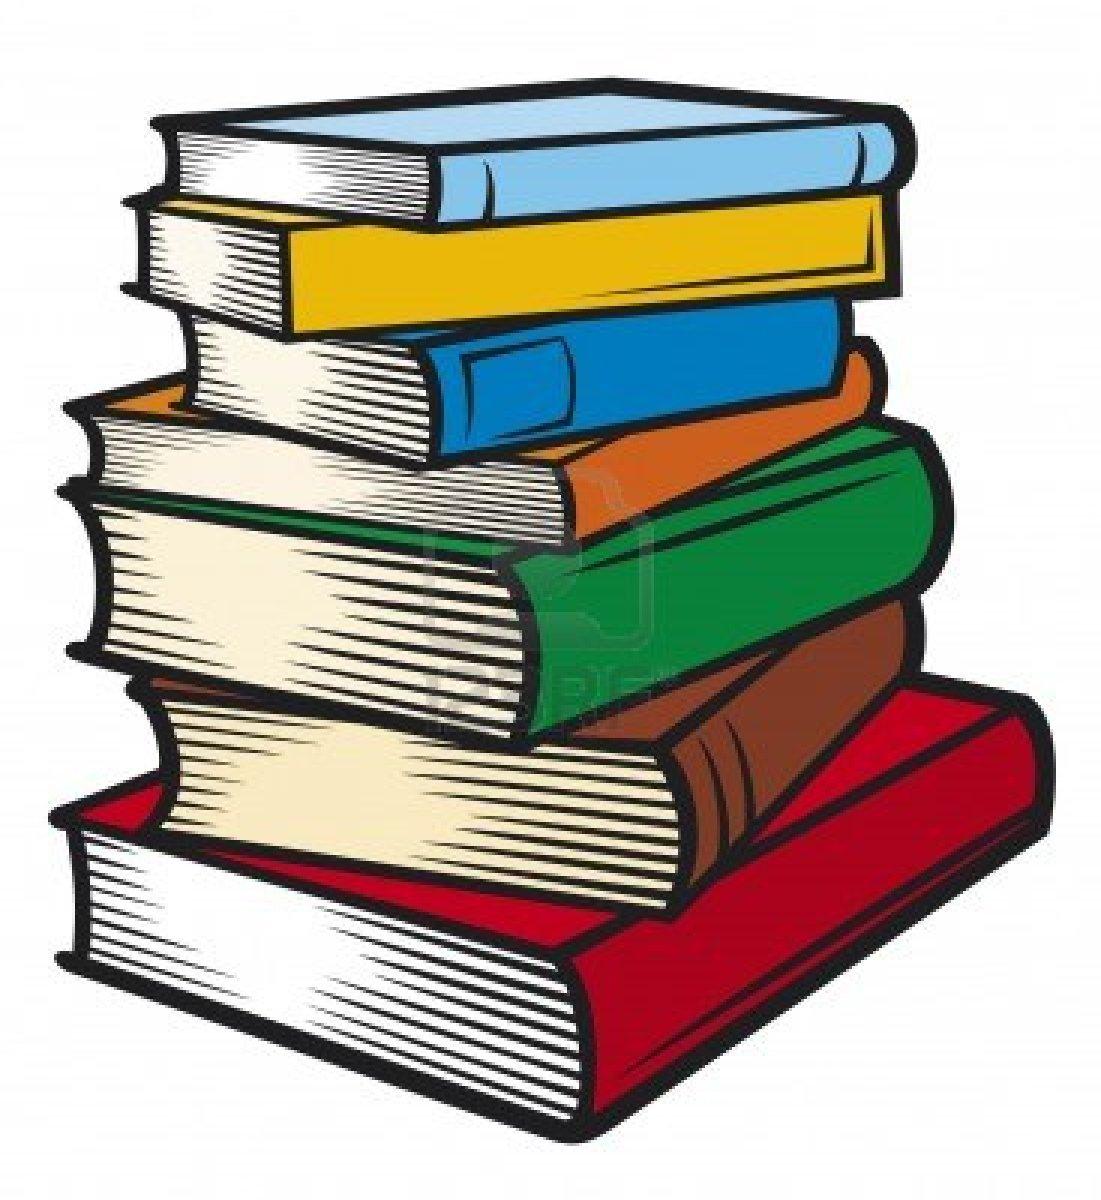 Stack Of Books Clip Art | Clipart librar-Stack Of Books Clip Art | Clipart library - Free Clipart Images-8